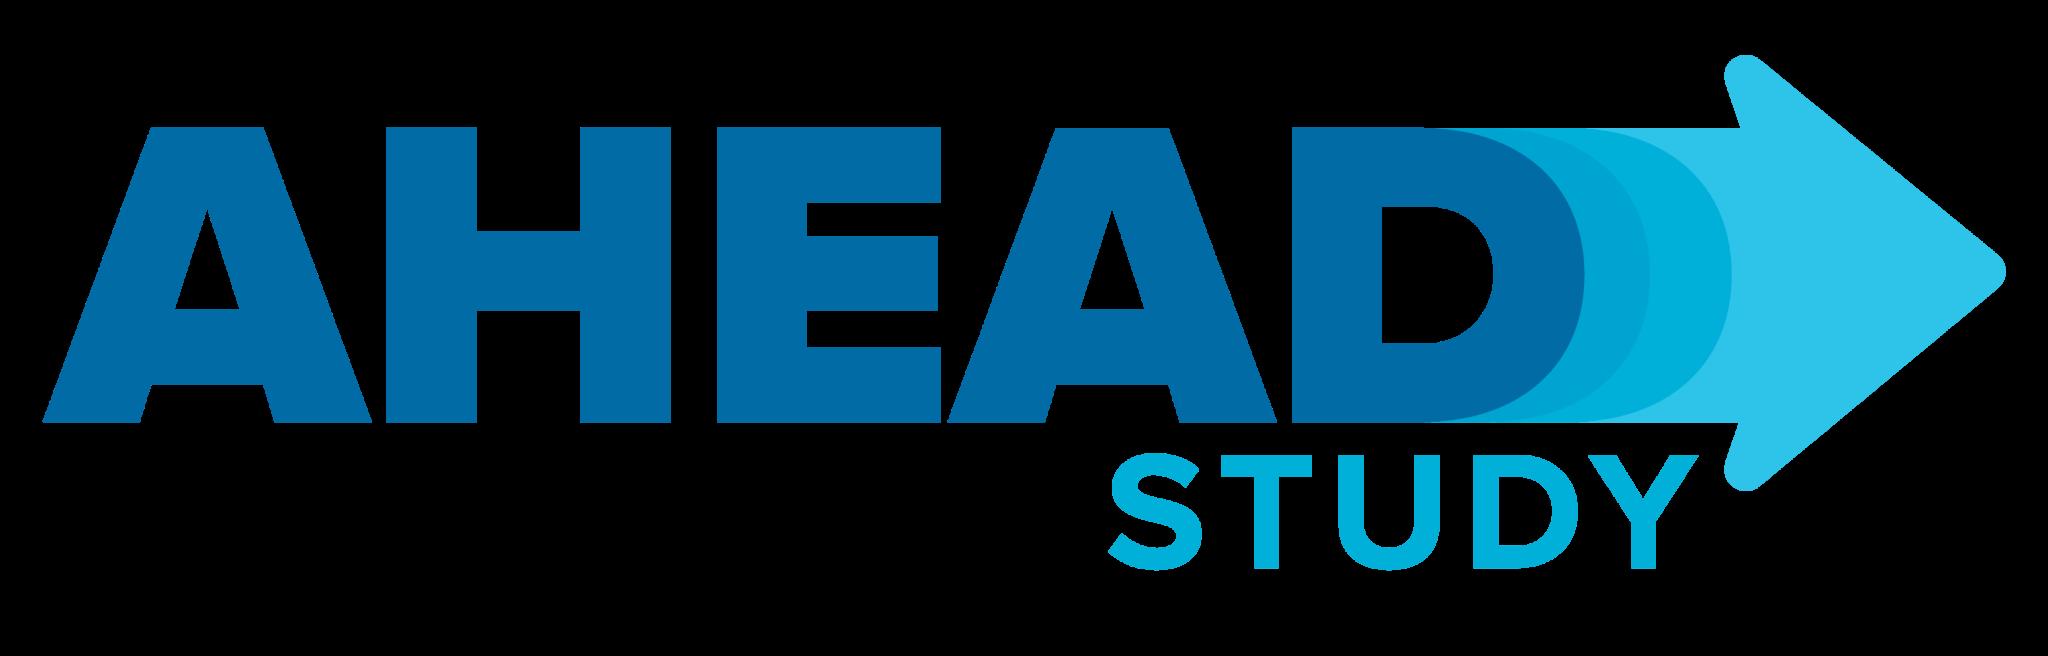 AHEAD 3-45 Alzheimer's study logo